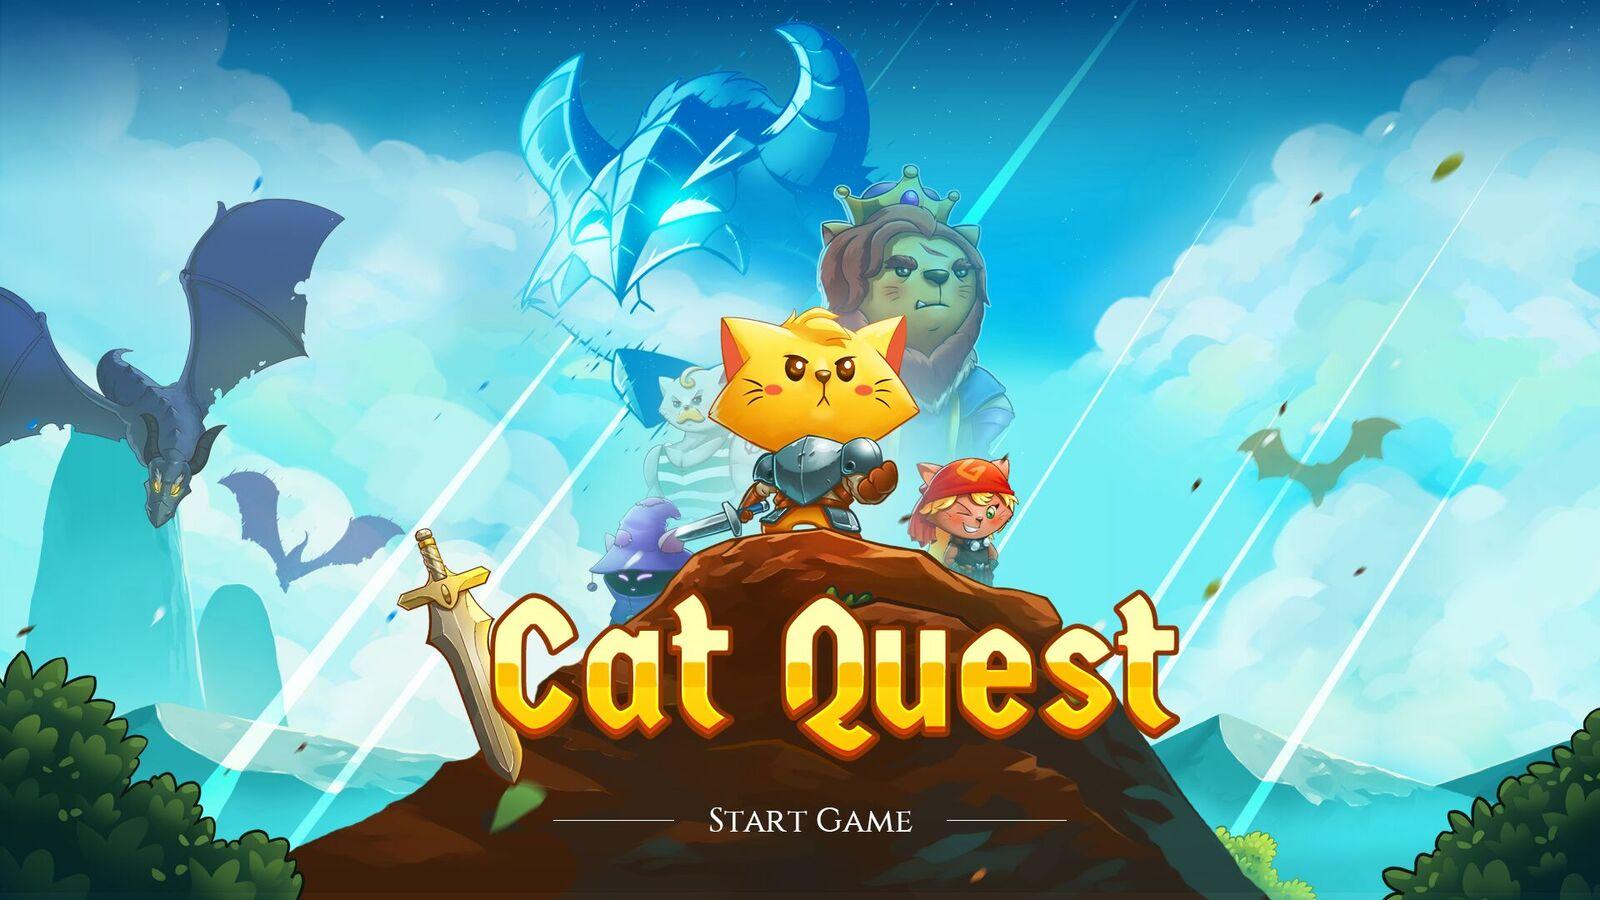 Cat Quest, un RPG muy felino, llega en exclusiva a PS4 el 10 de noviembre